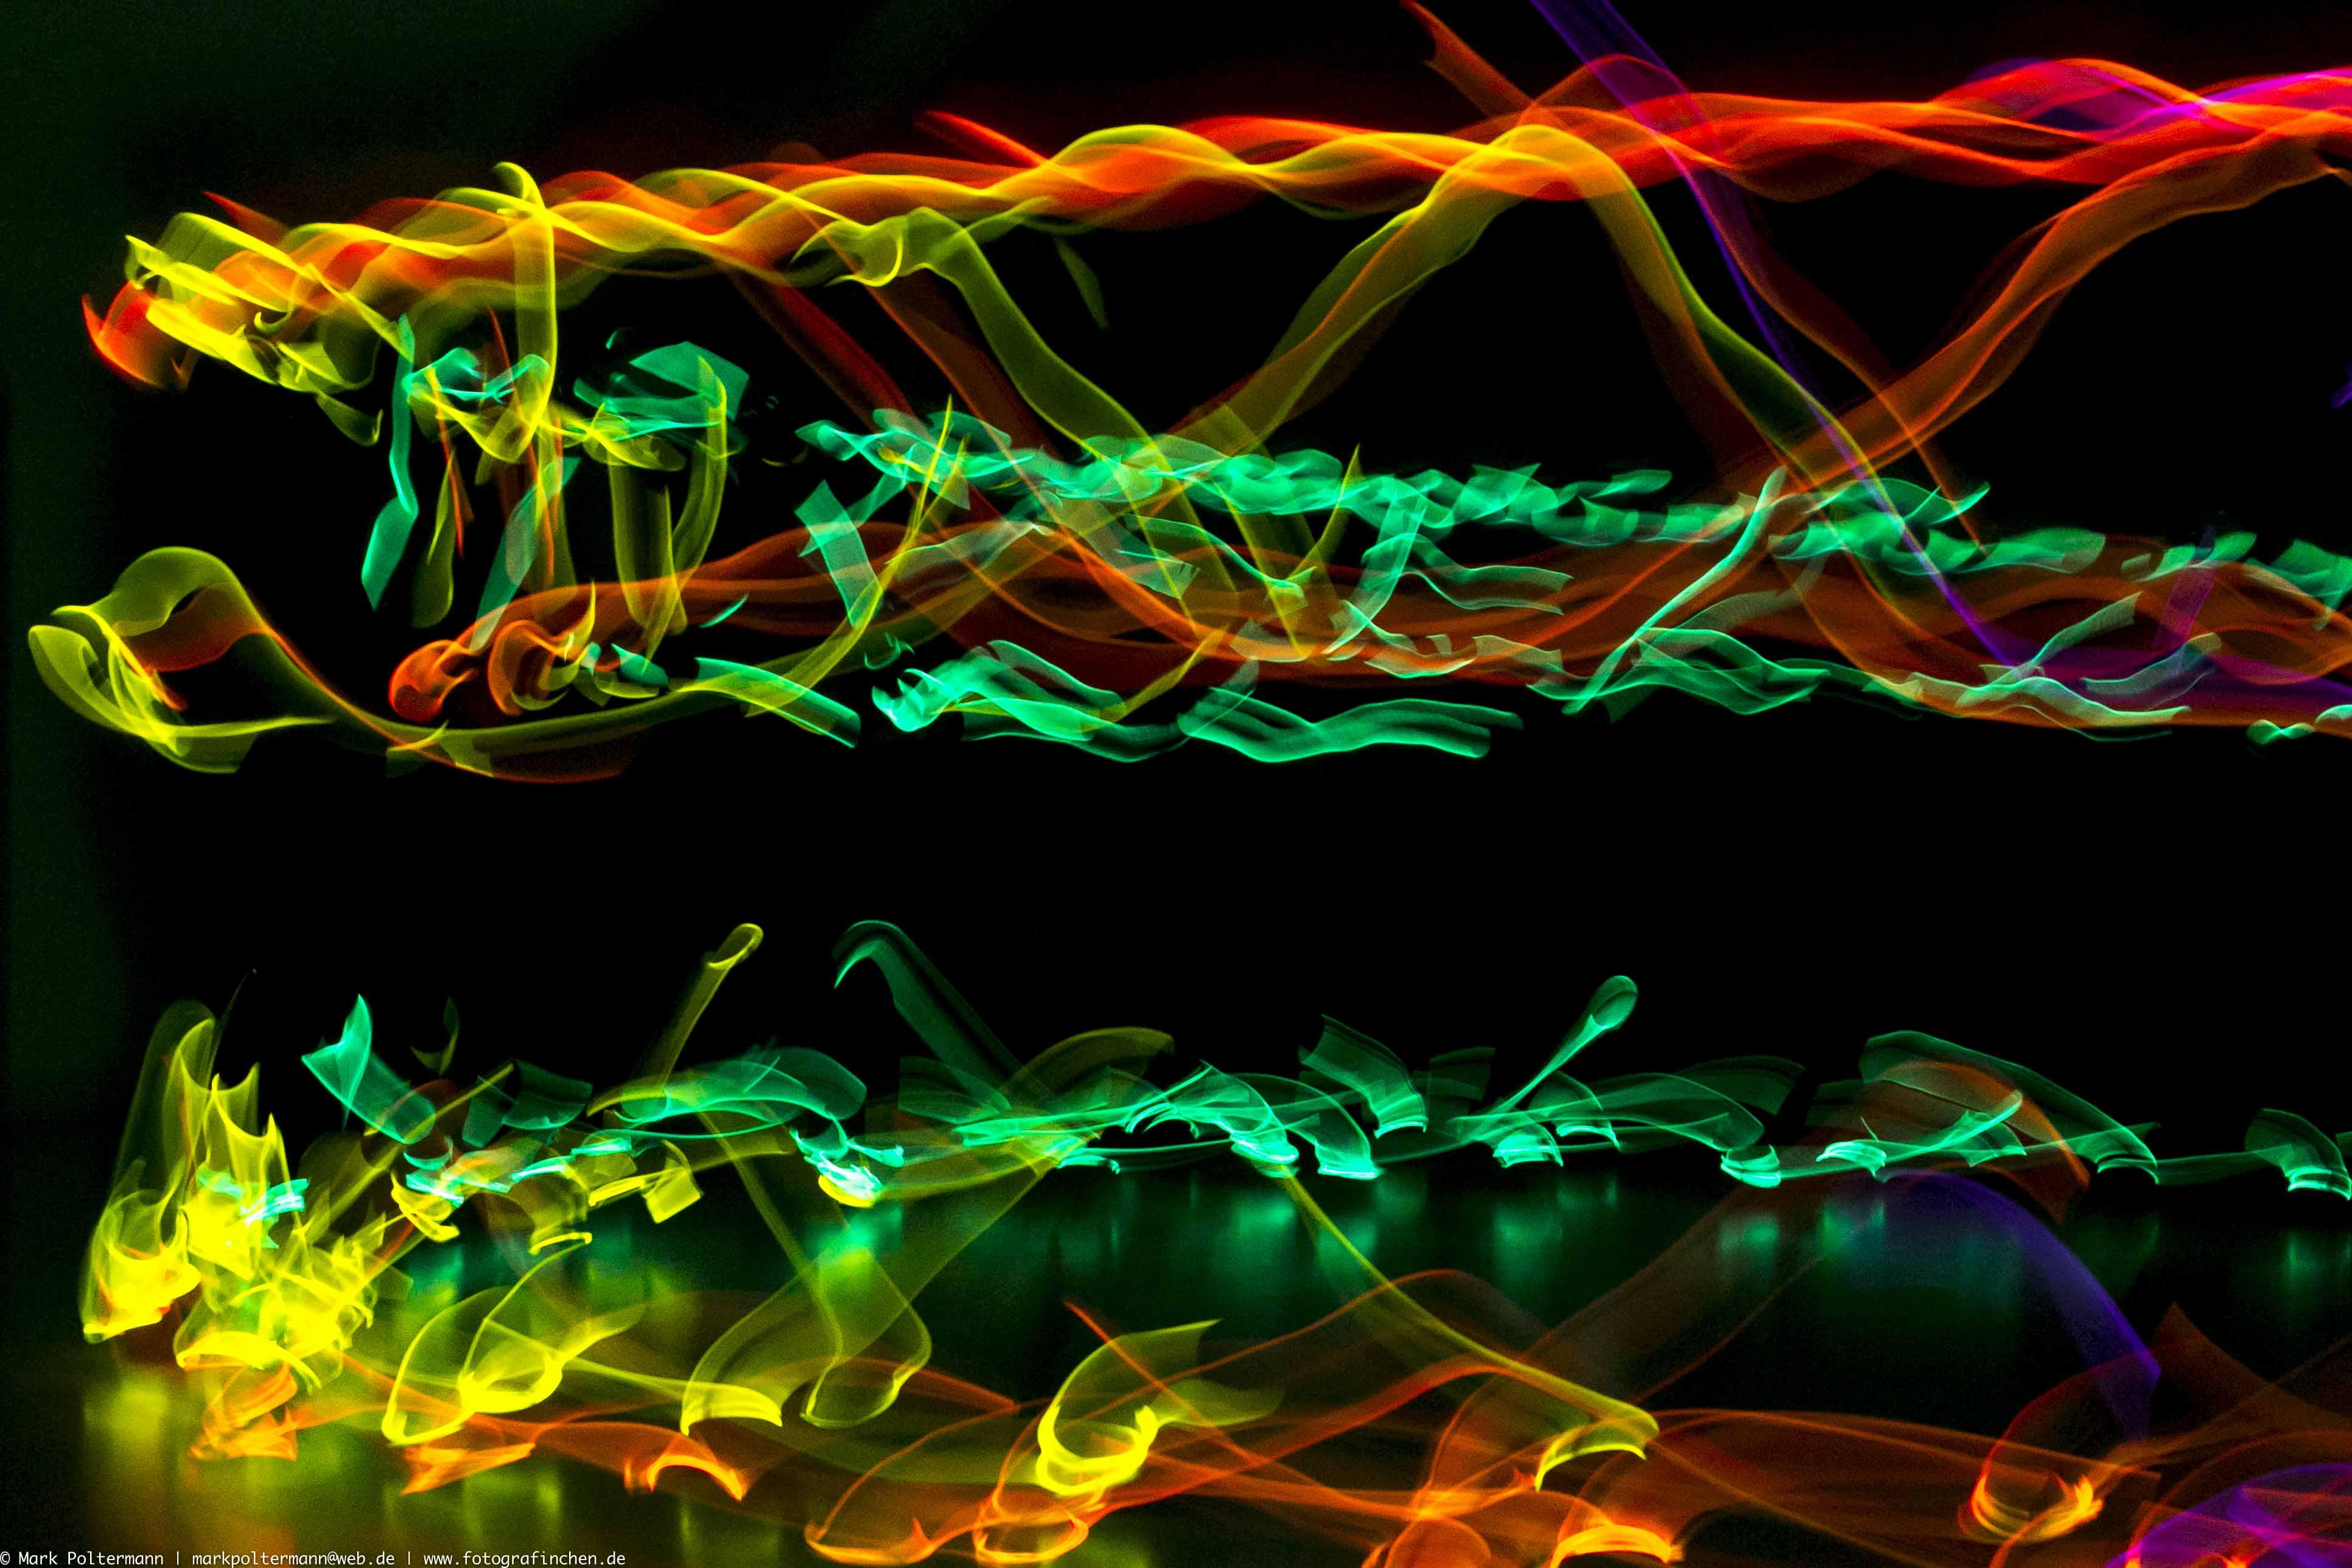 glowing-in-the-dark_20131130_001